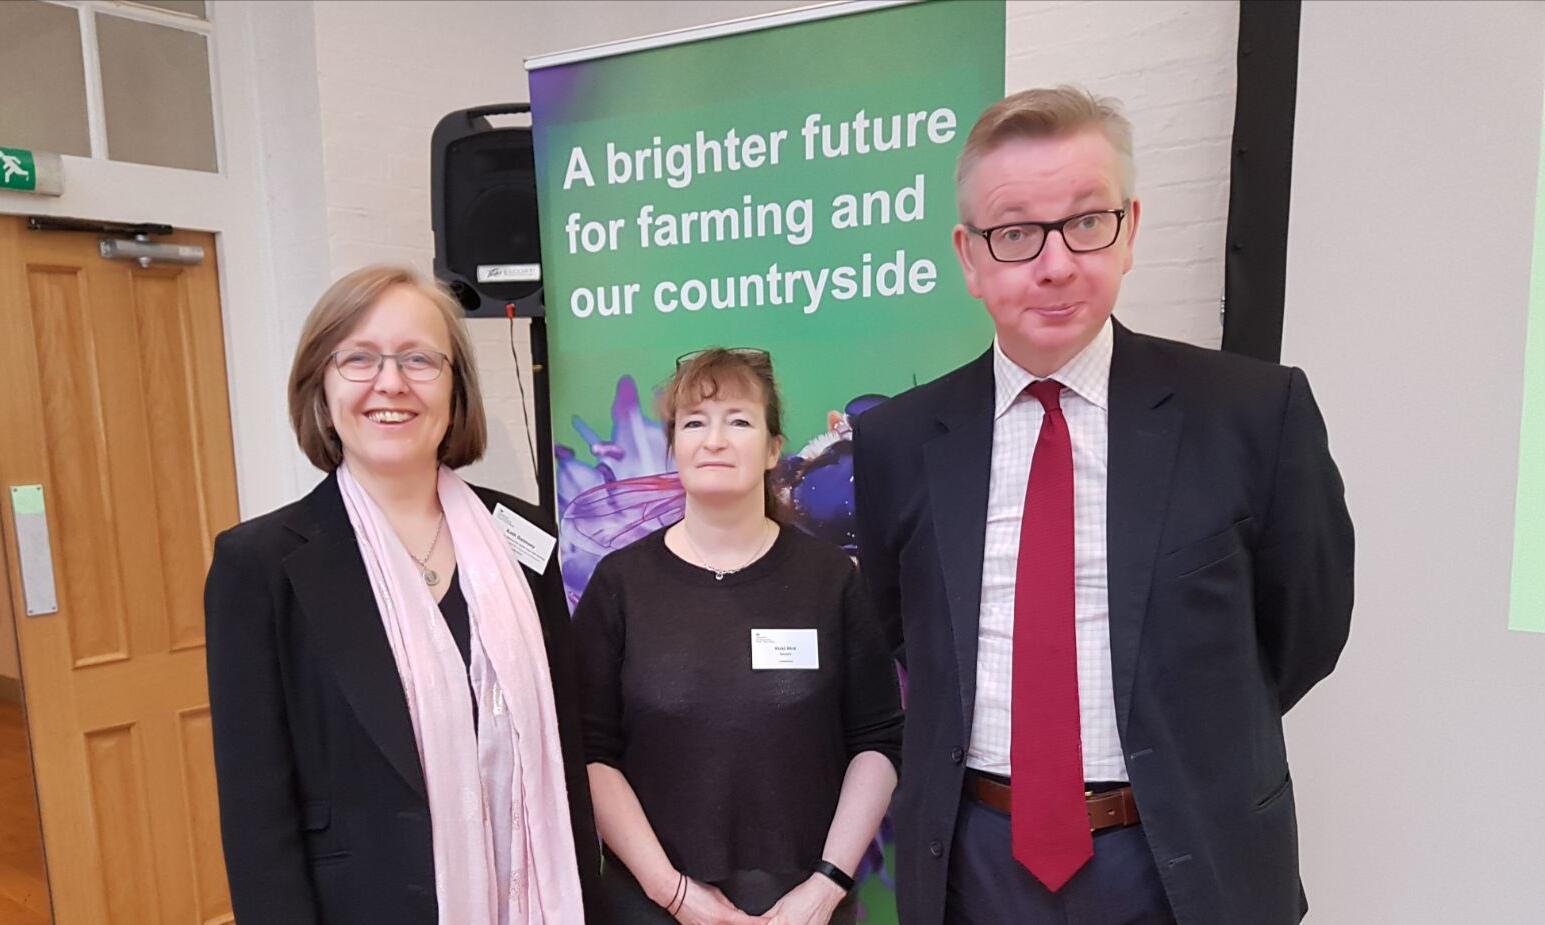 Kath Dalmeny, Vicki Hird, Michael Gove MP